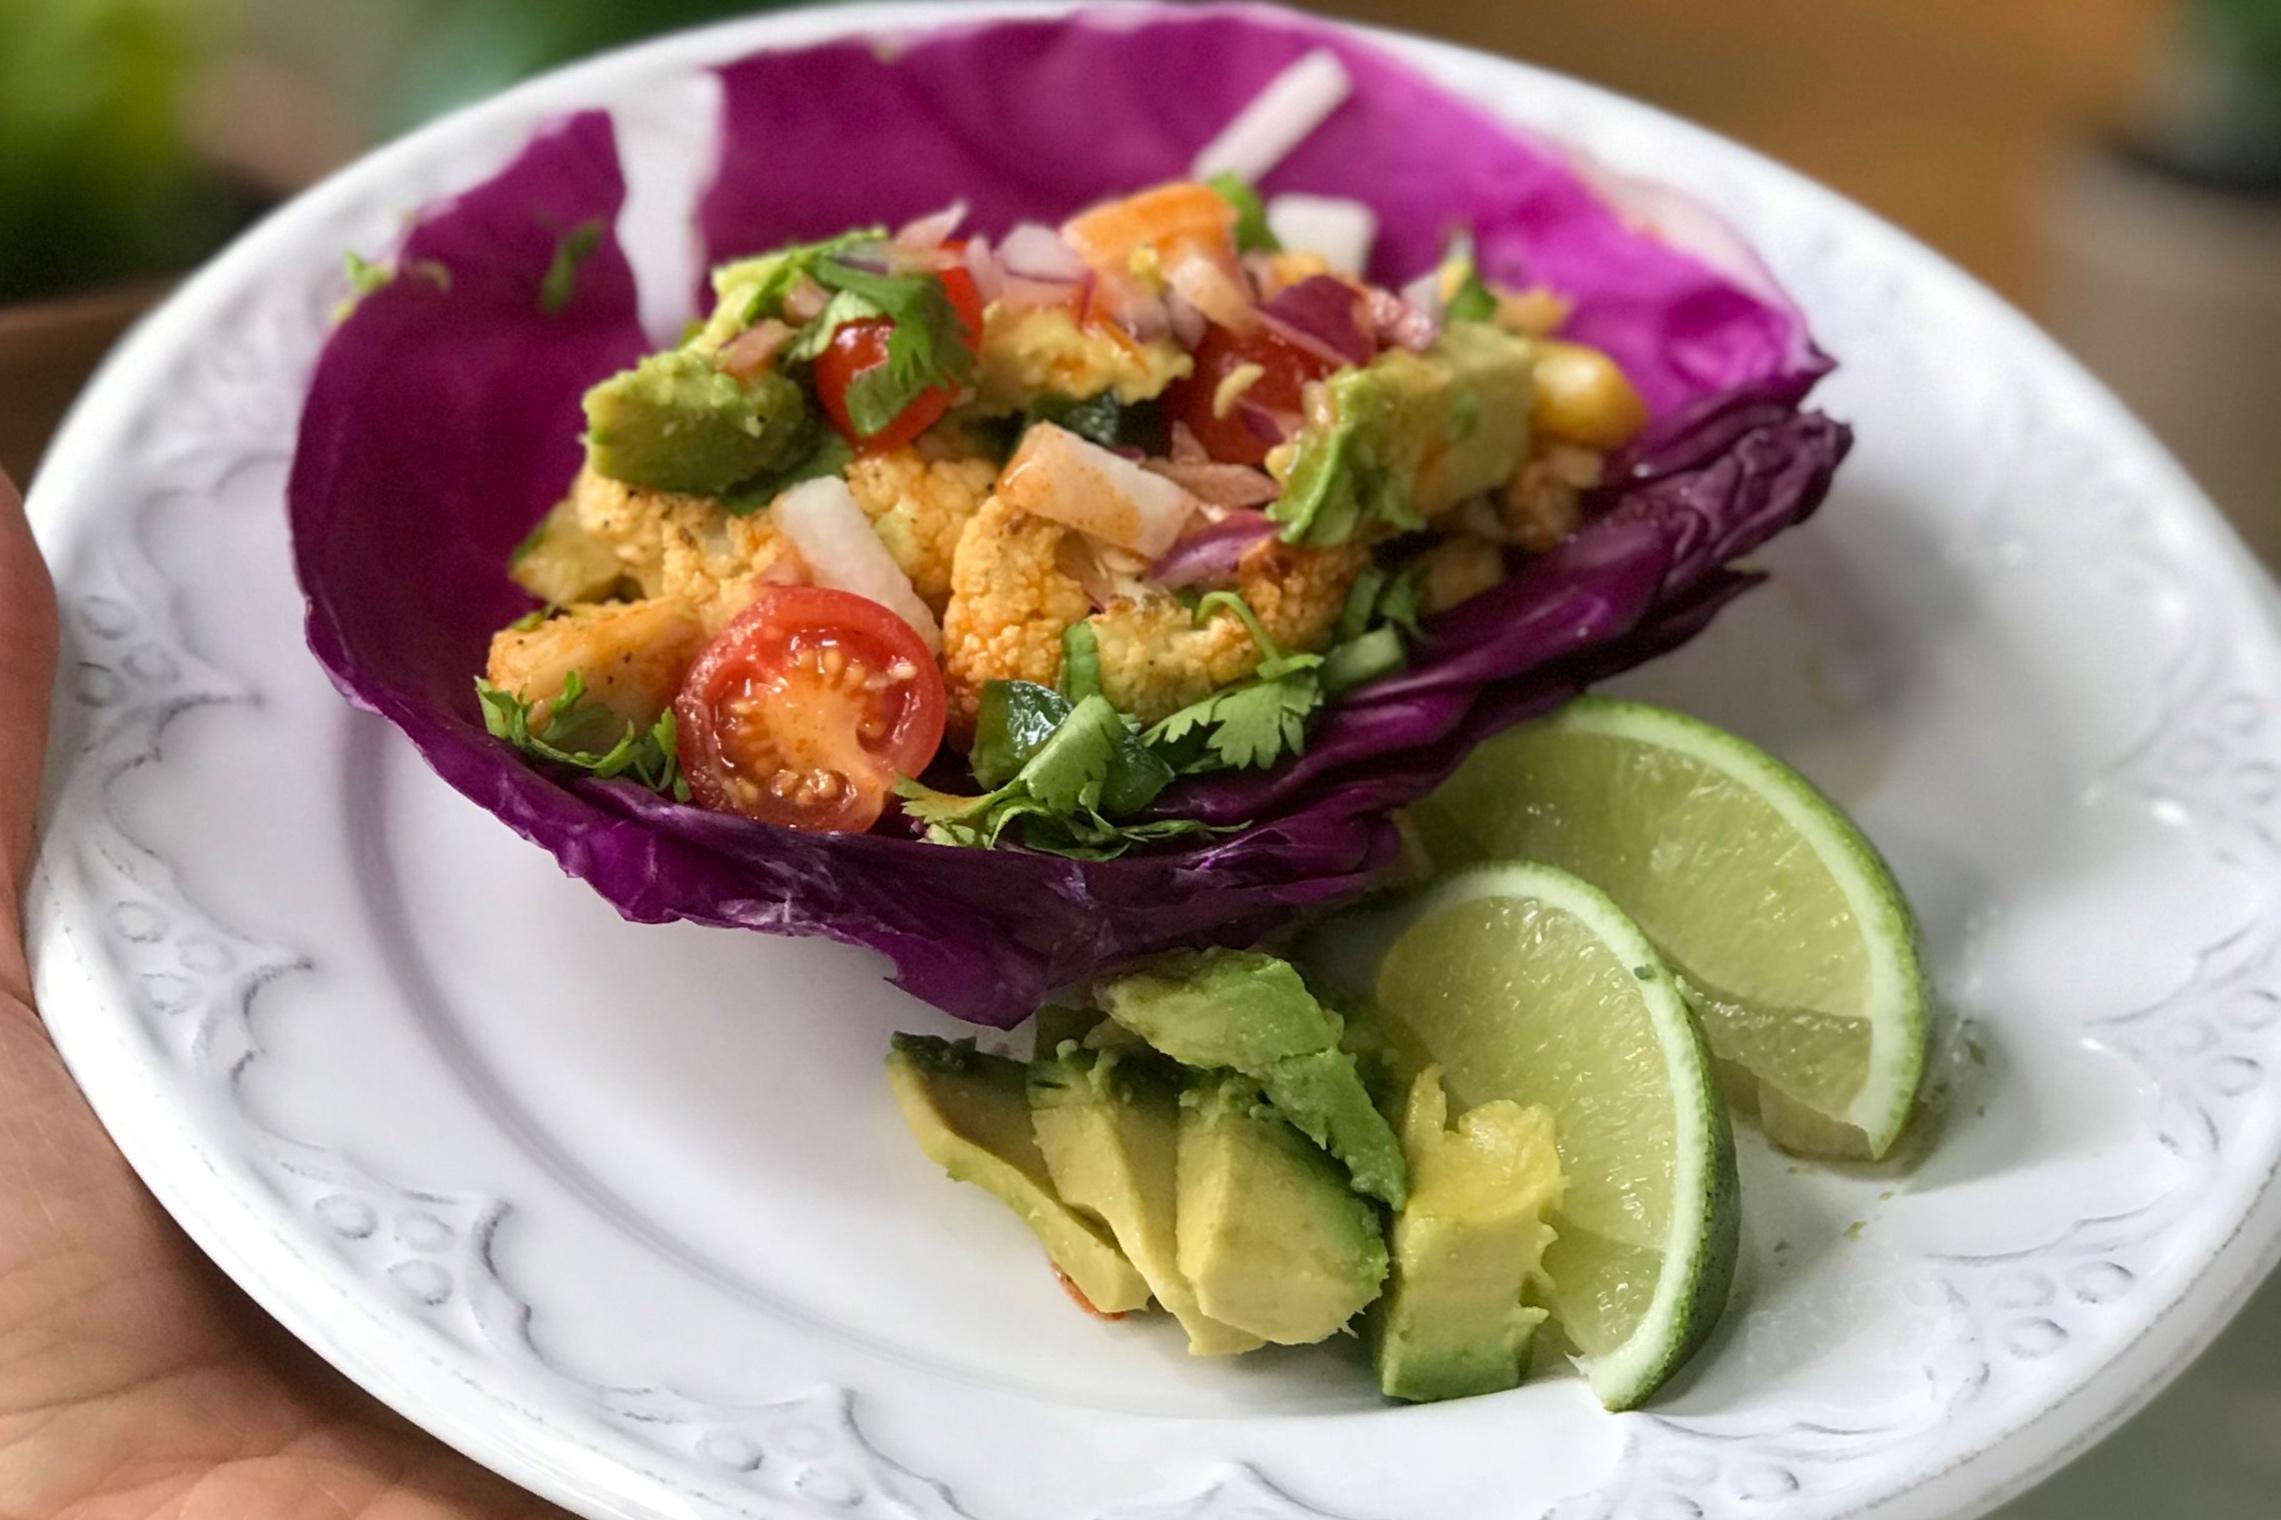 Buffalo Cauliflower Tacos - Meatless meal amazingness!